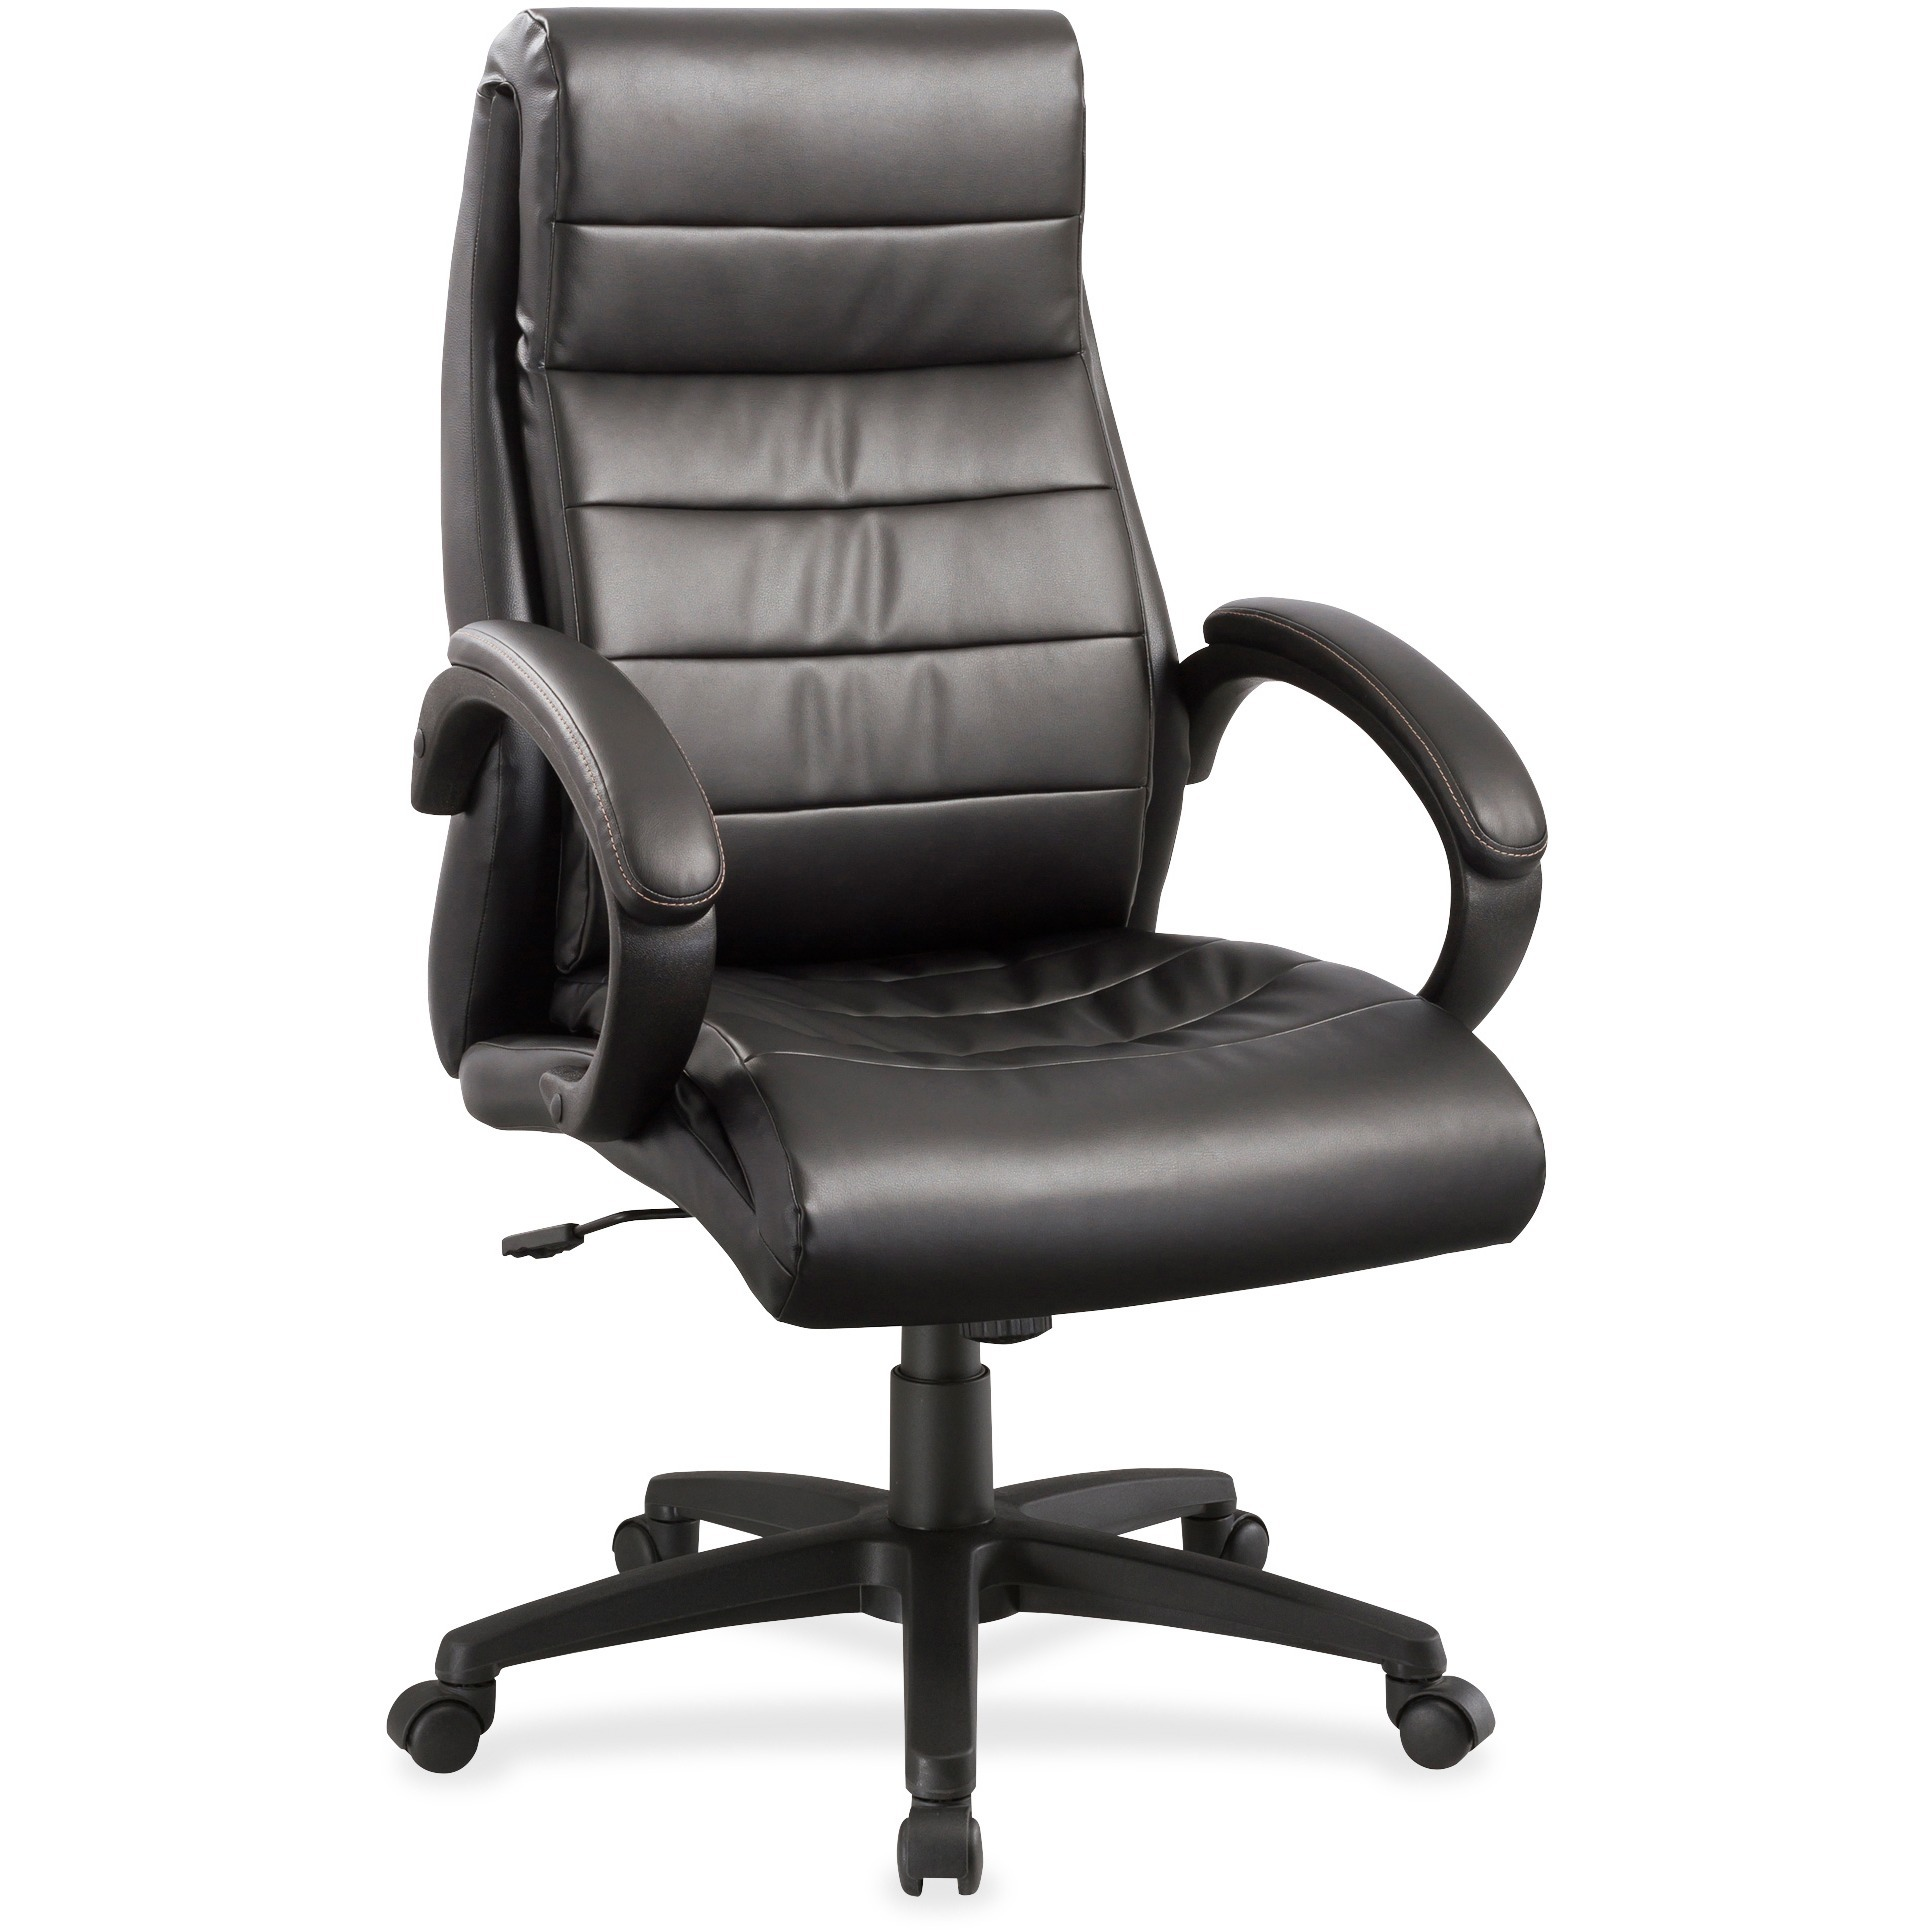 Cheez-it Crackers, Original, 1.5 oz Pack, 45 Packs/Carton